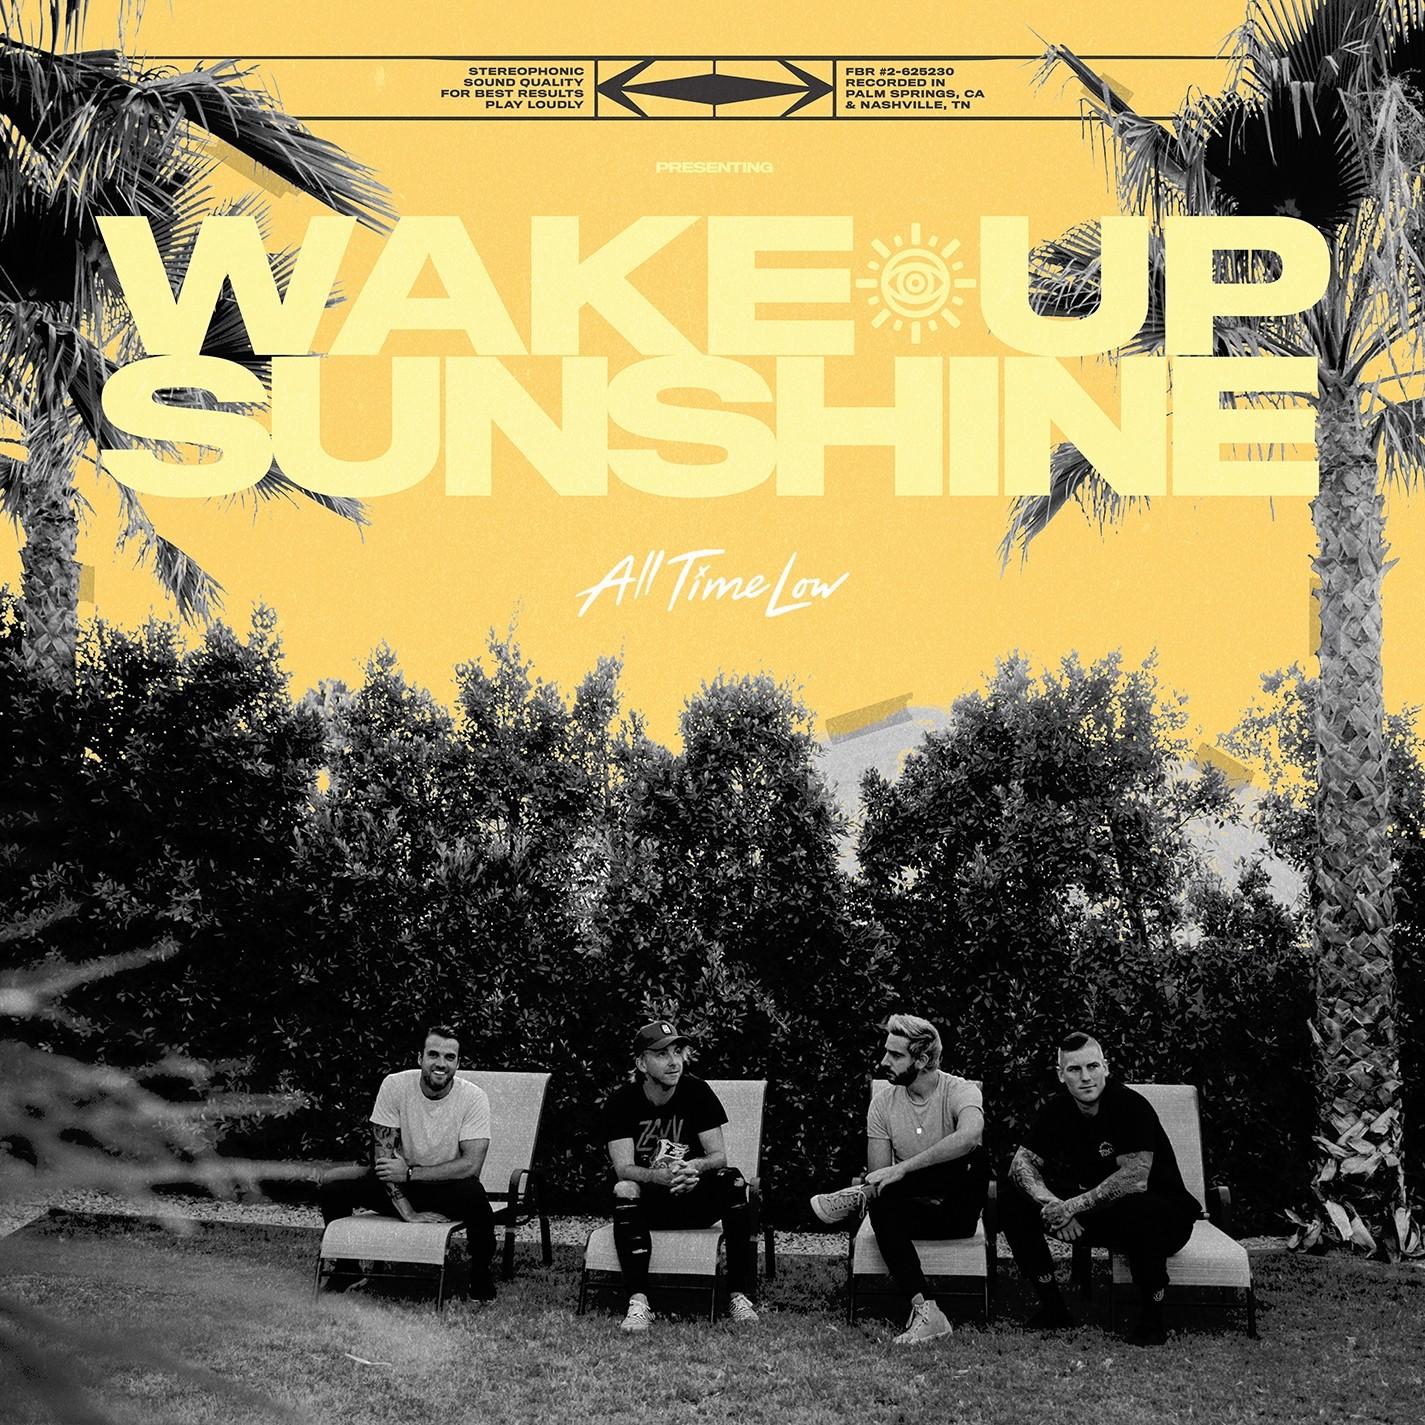 All Time Low - Wake Up, Sunshine Vinyl LP